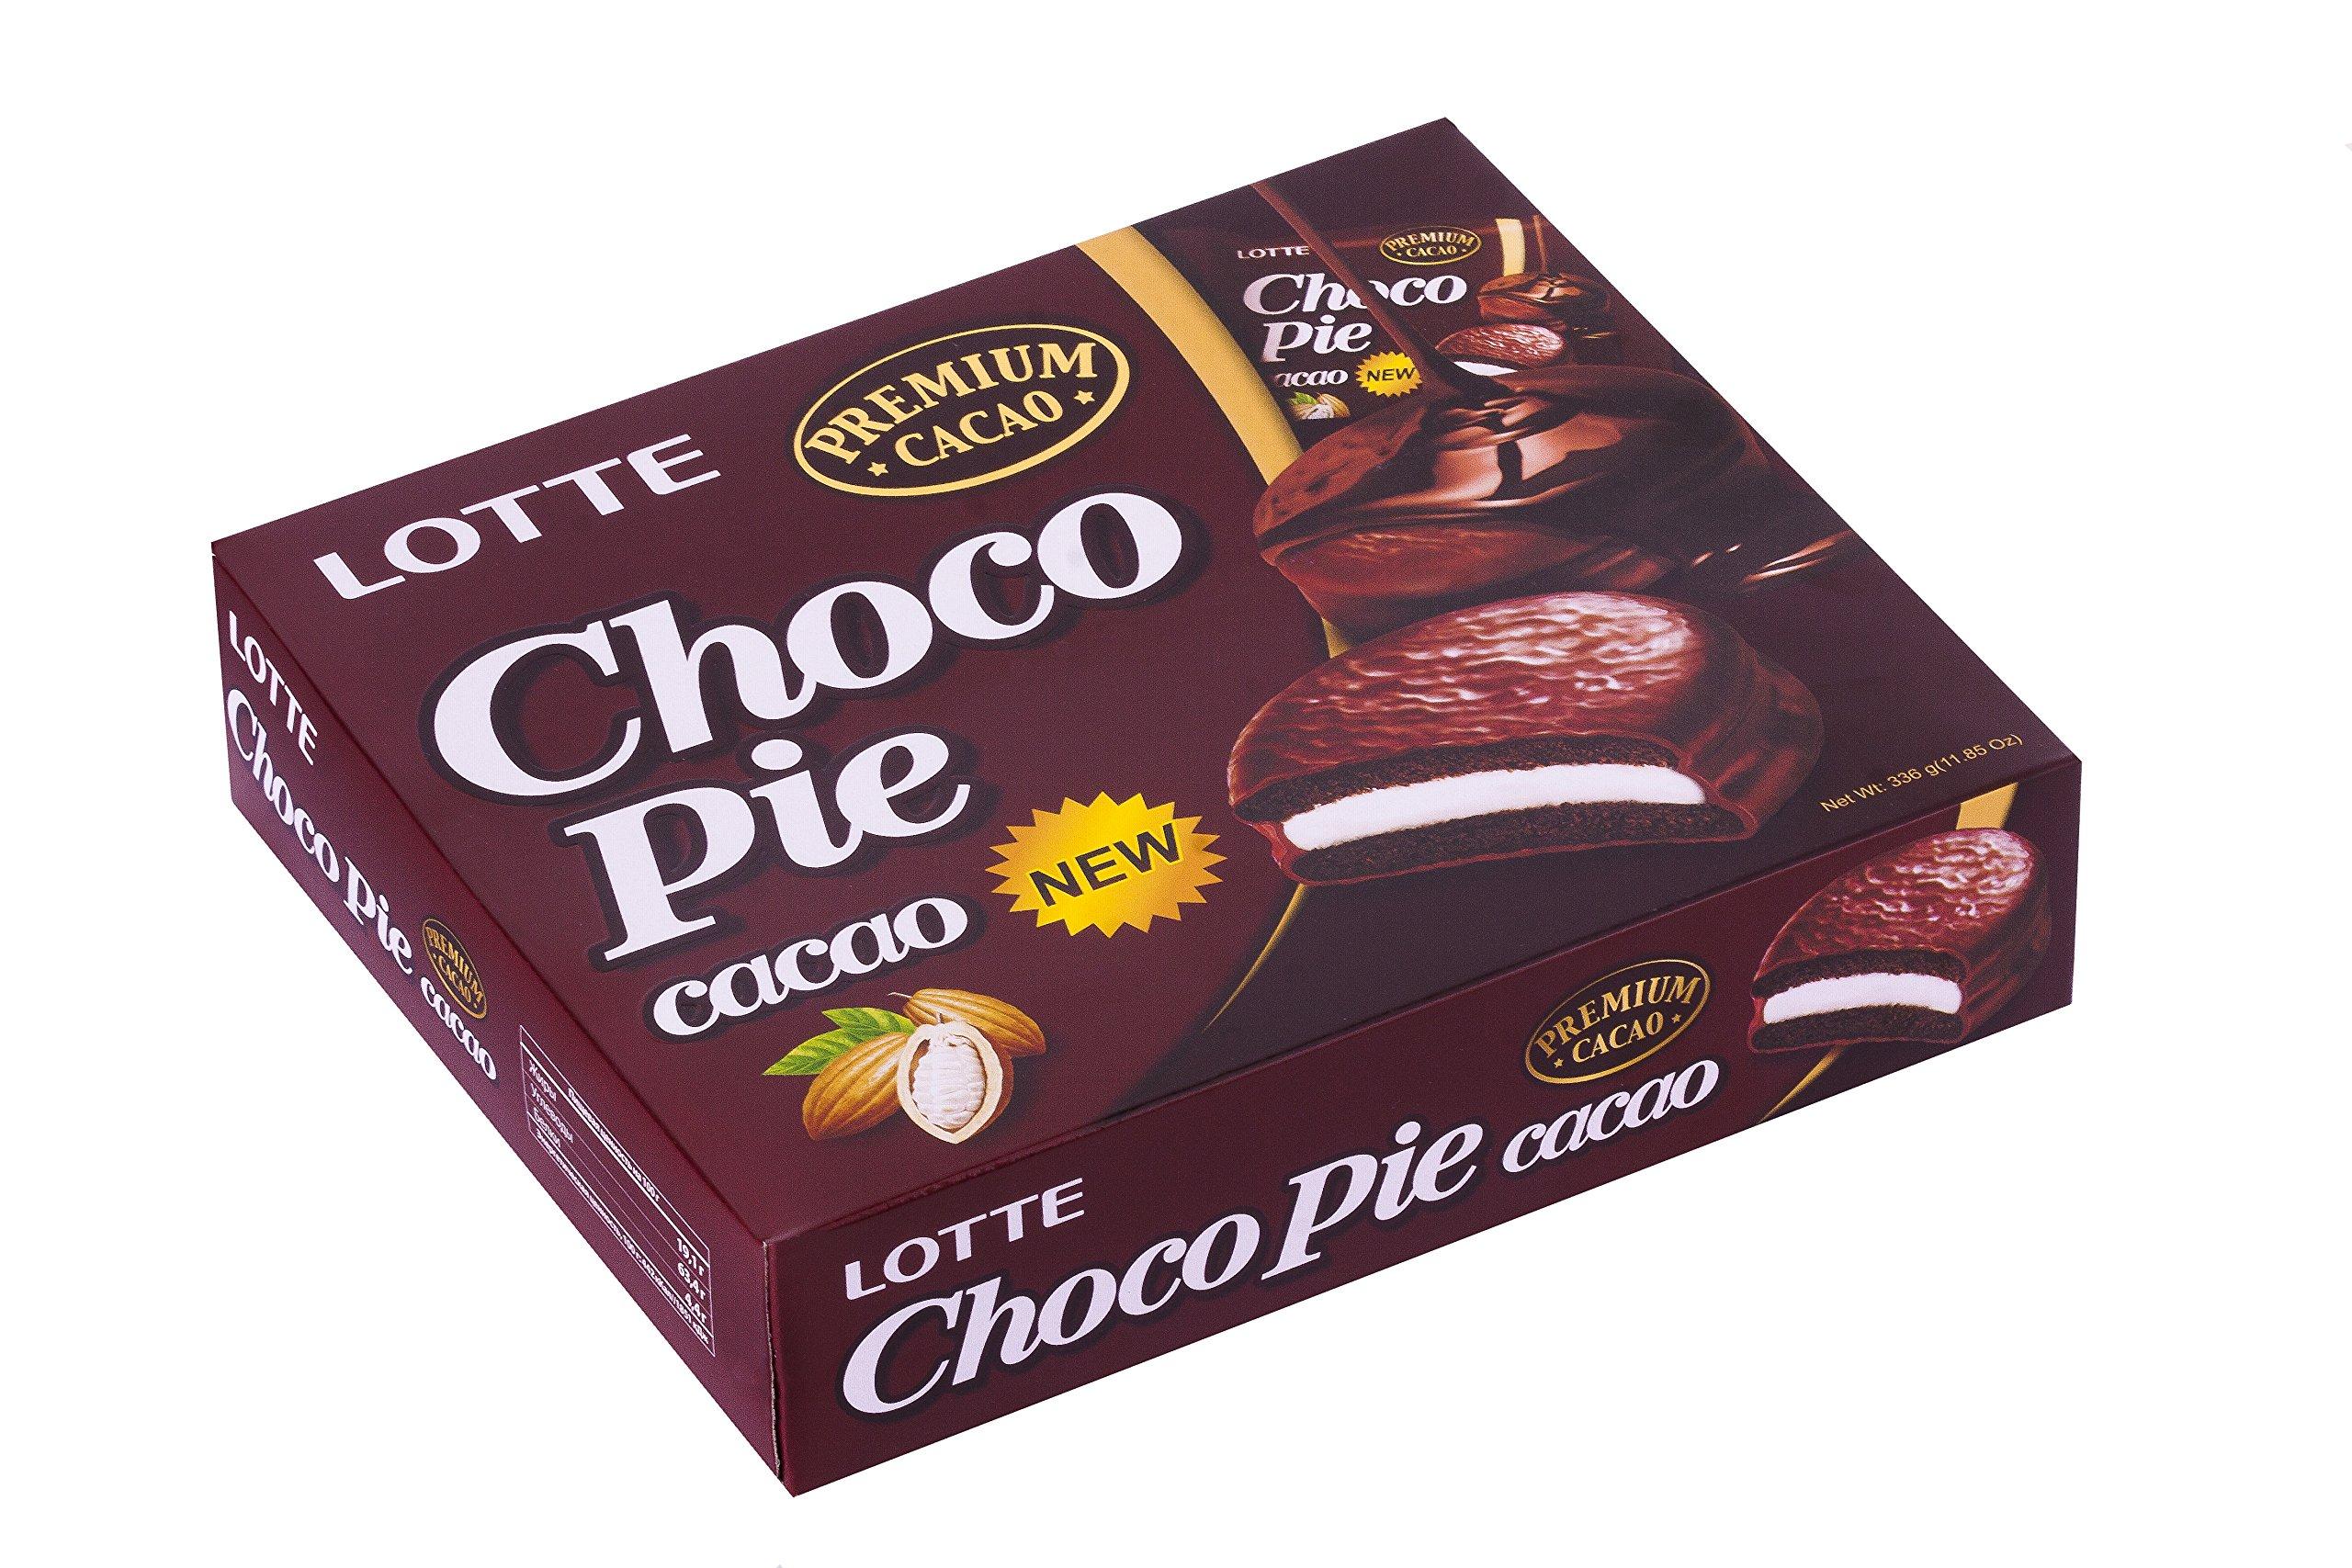 LOTTE Chocopie Cacao Pie, 11.85 Ounce